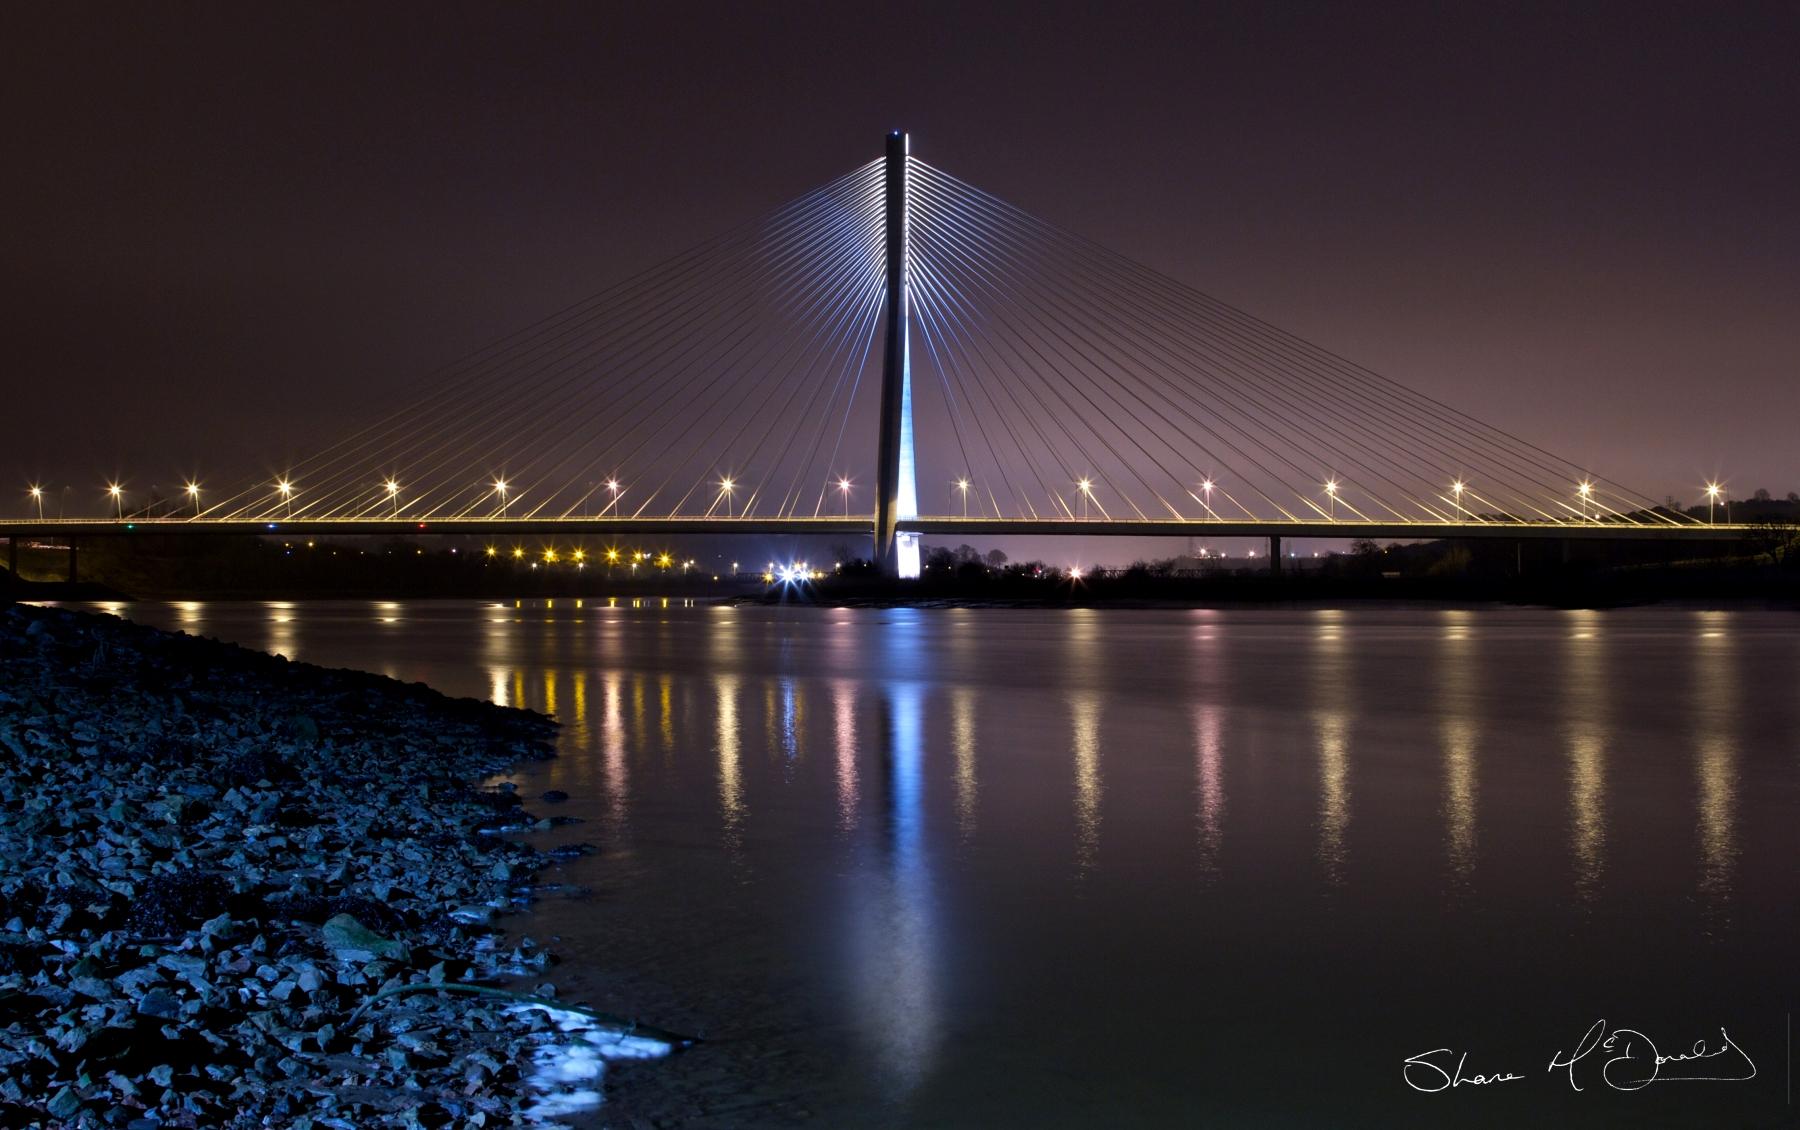 Waterford N25 Bridge at Night